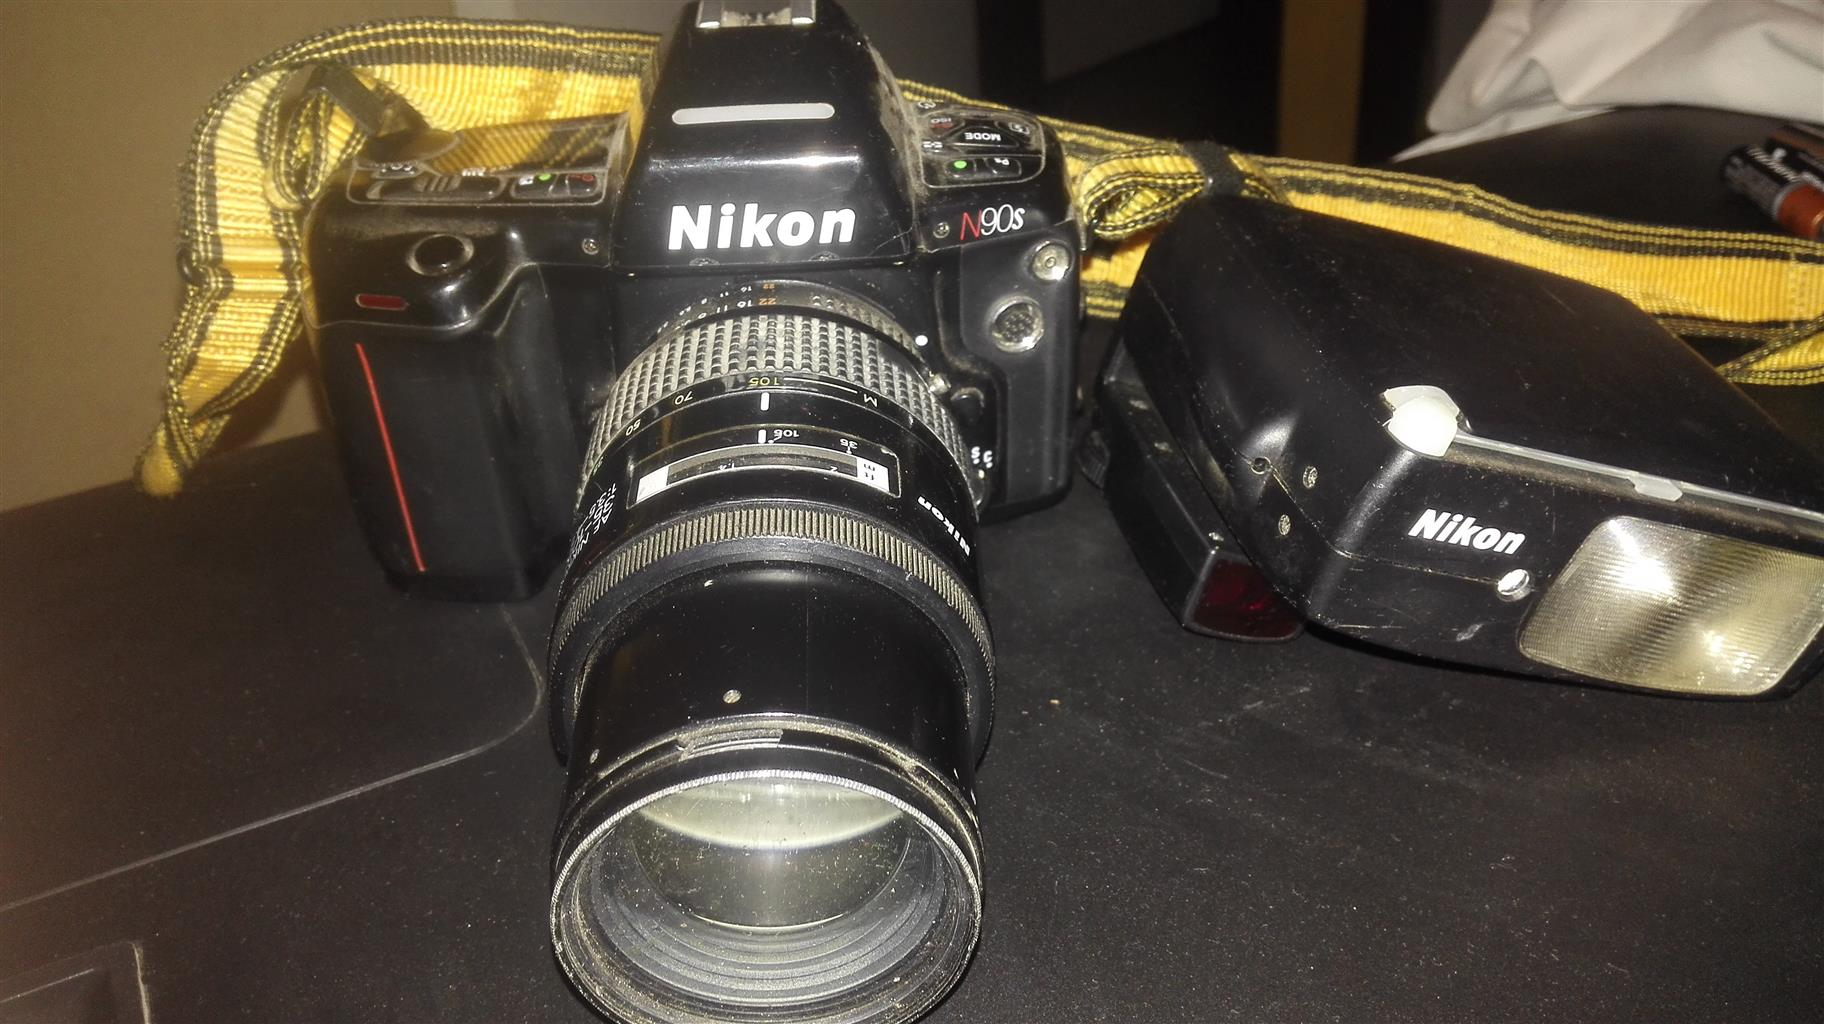 Nikon plus FLASH LIGHT